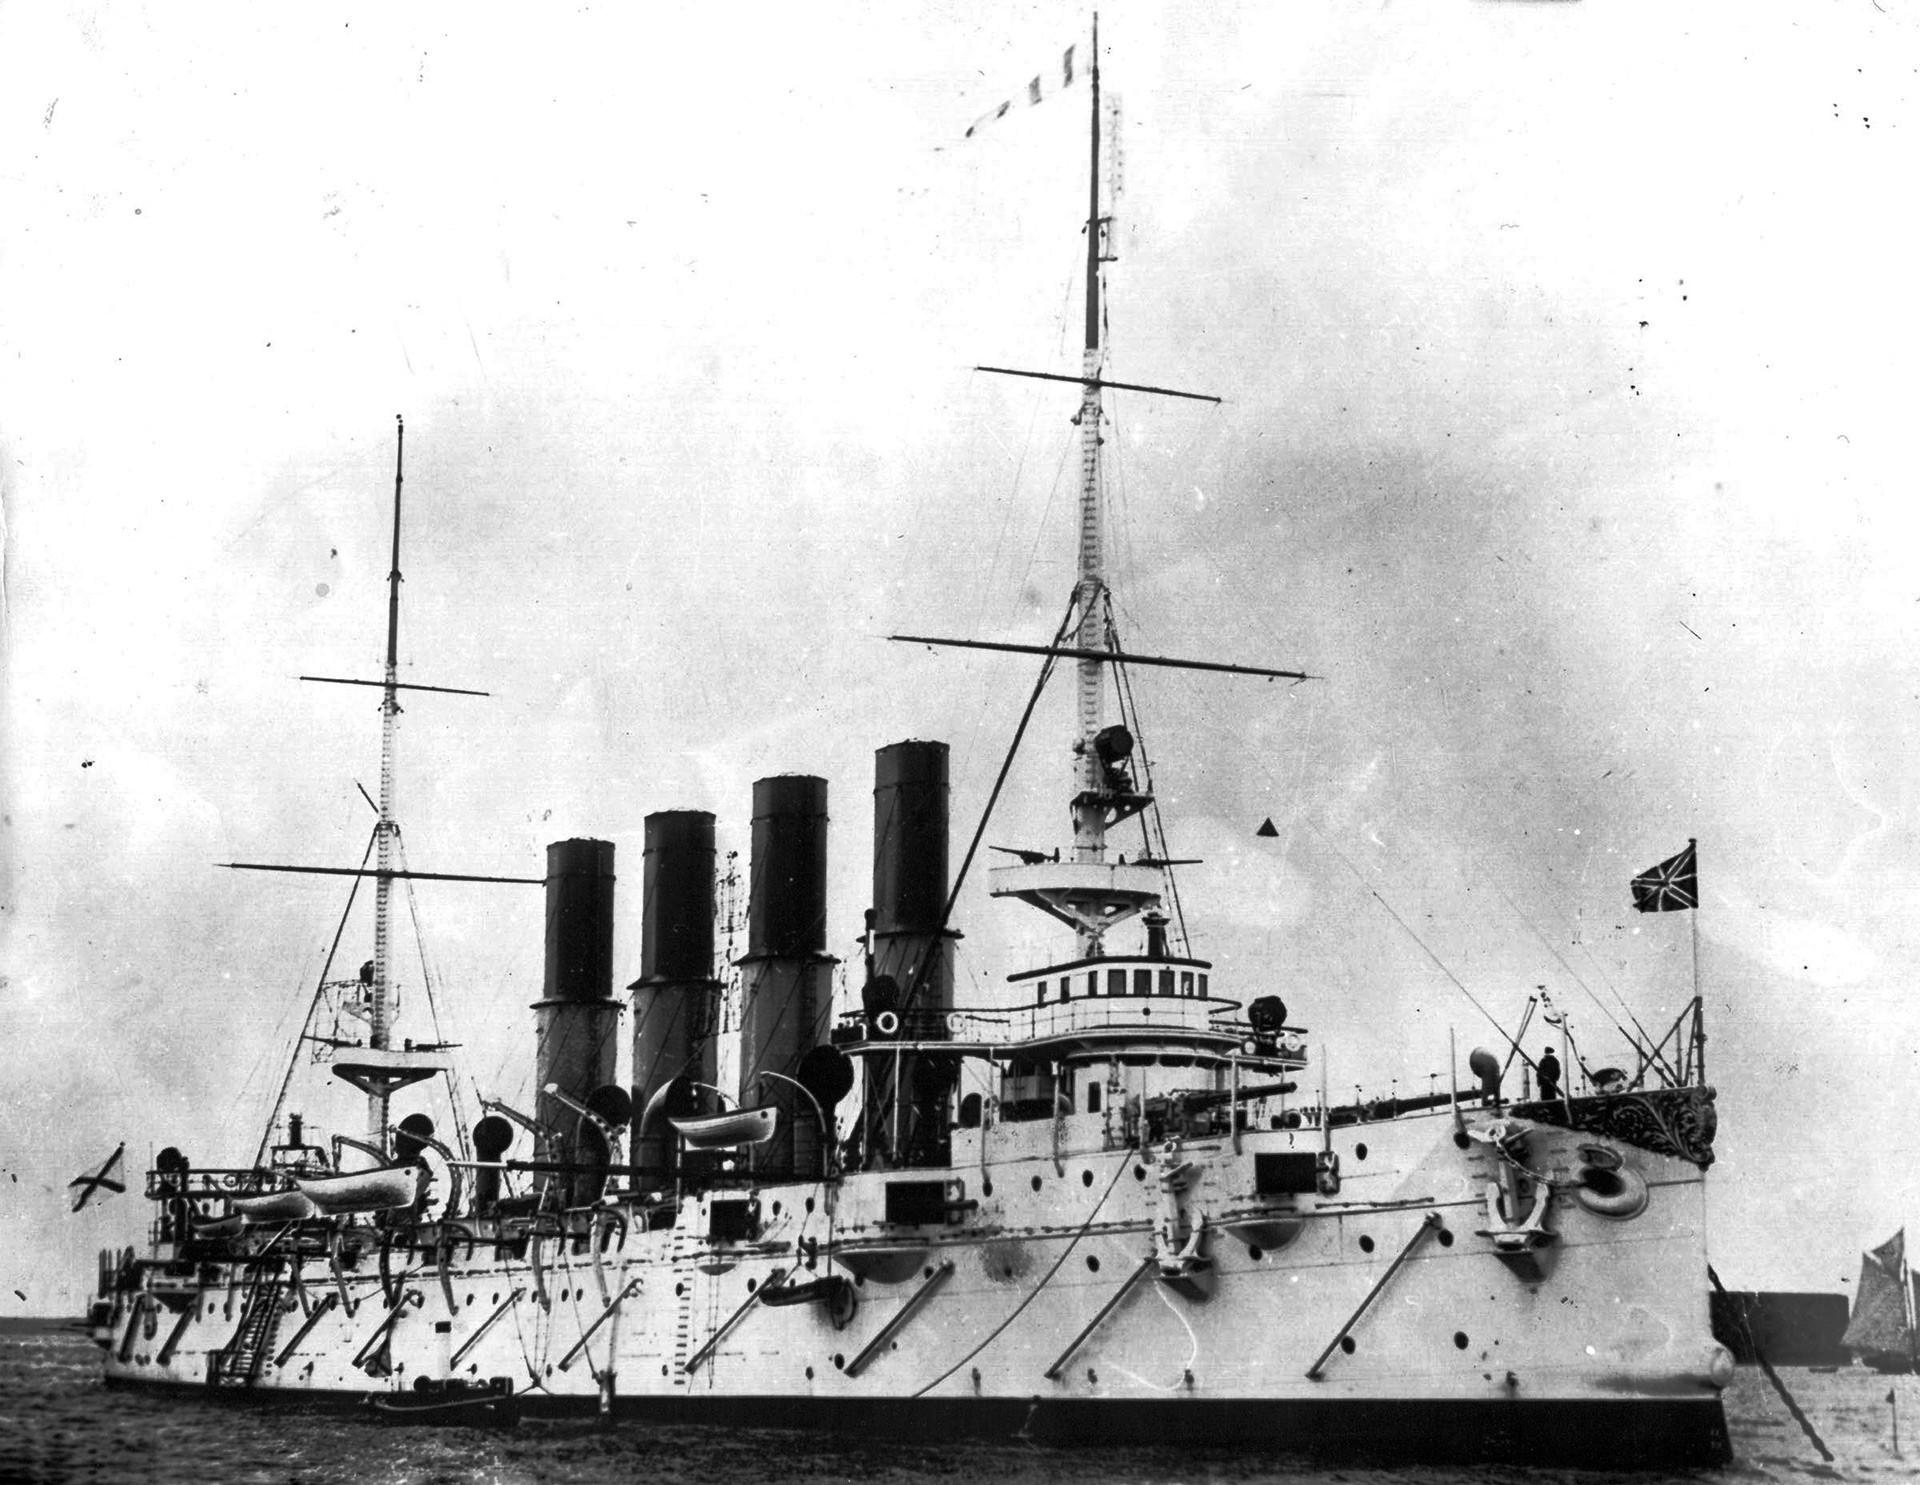 Cruzador imperial Varyag em Kronstadt